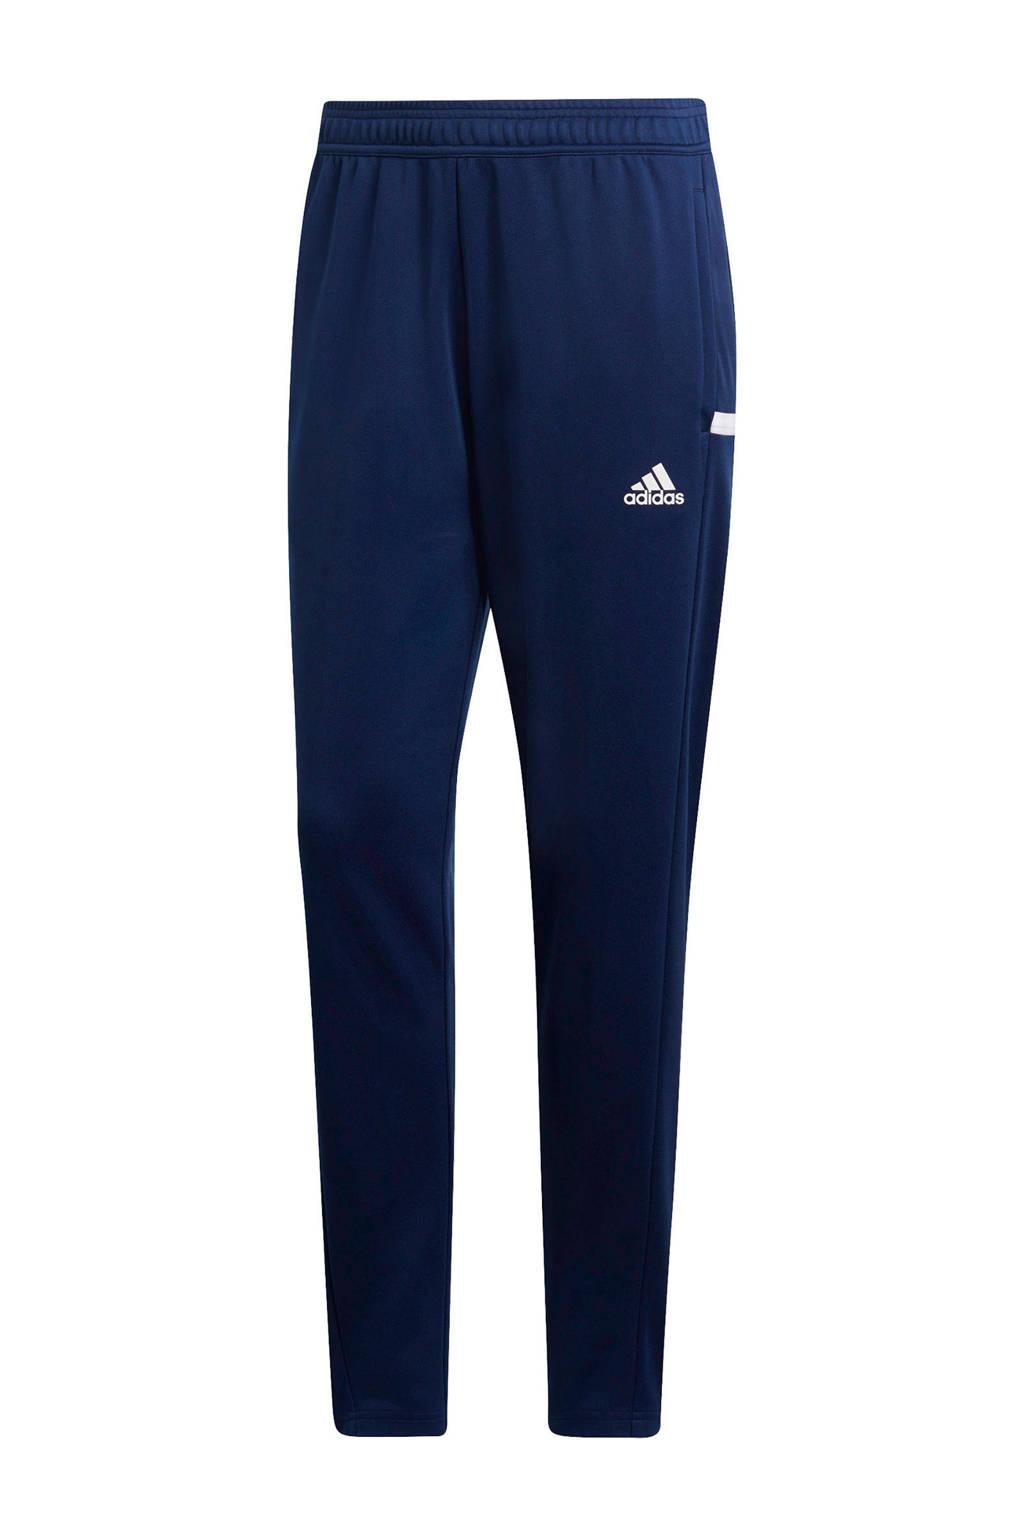 adidas Performance sportbroek T19 donkerblauw, Donkerblauw/wit